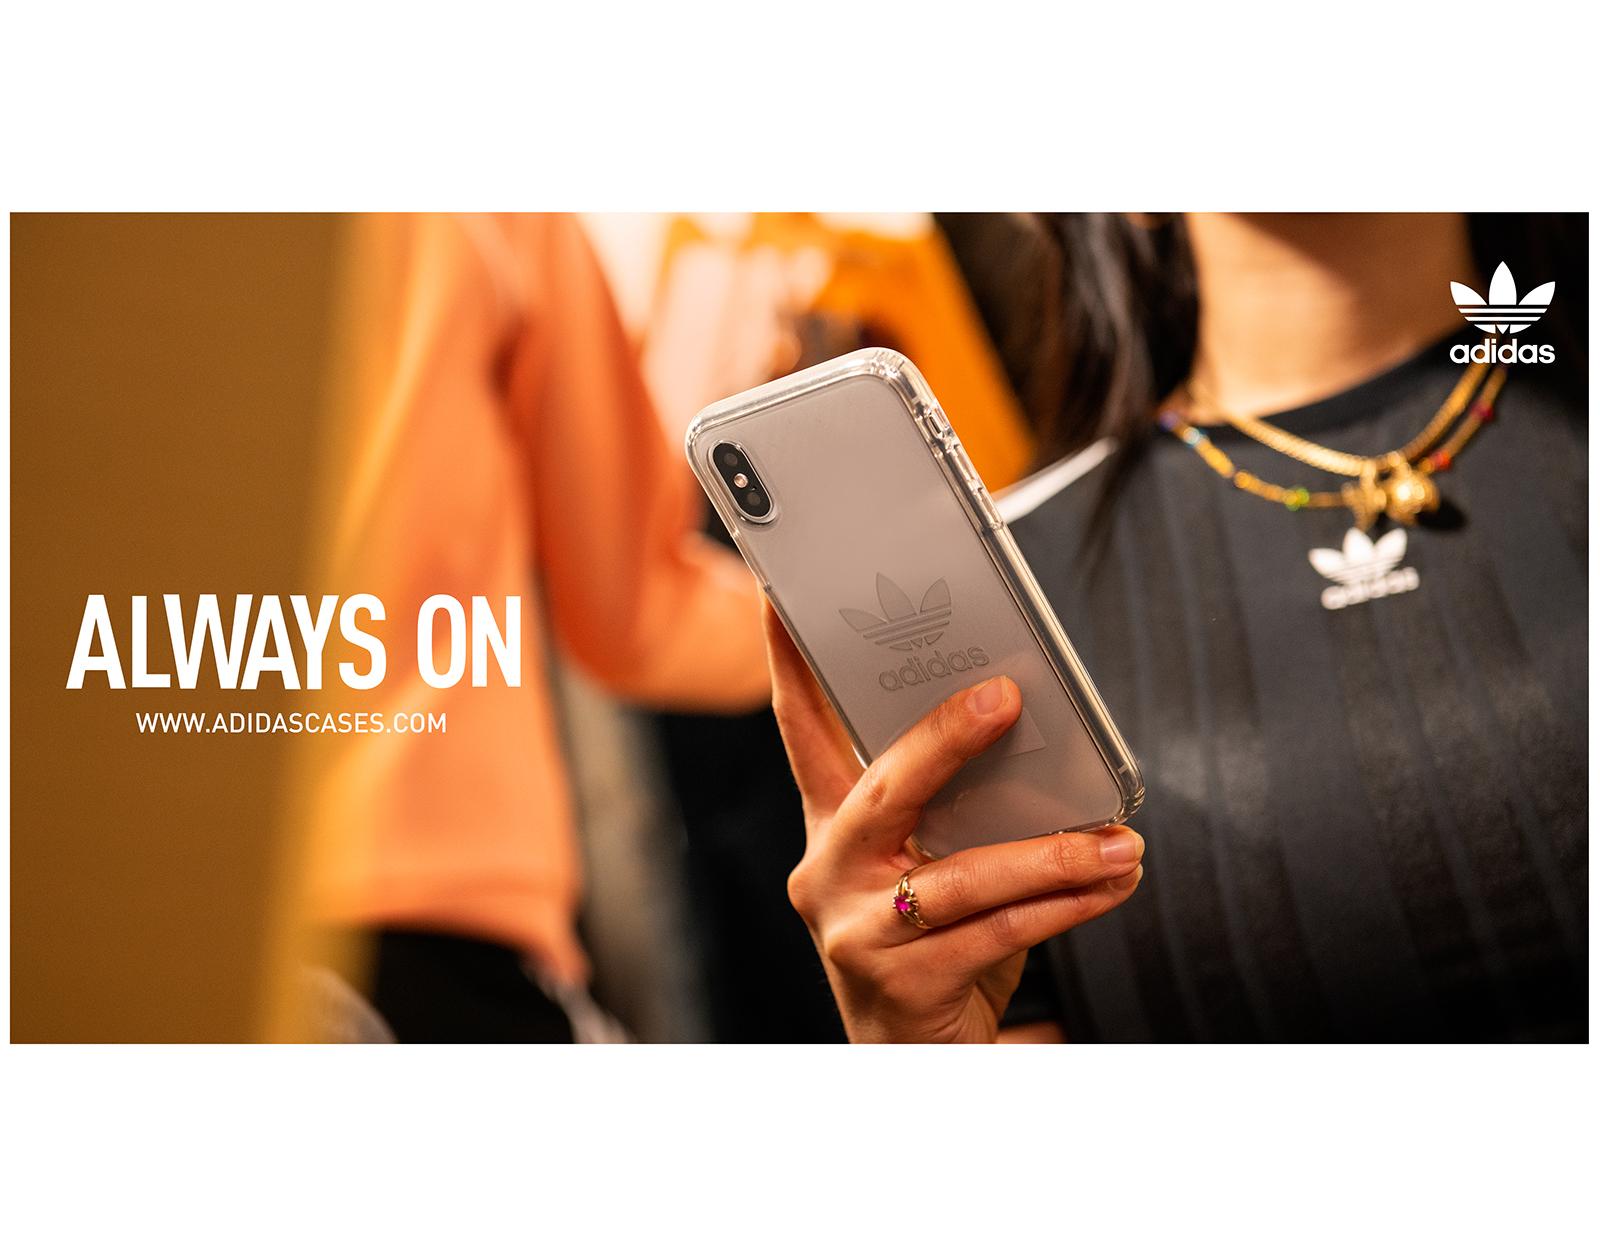 ASS_adidas_Always On 09.jpg